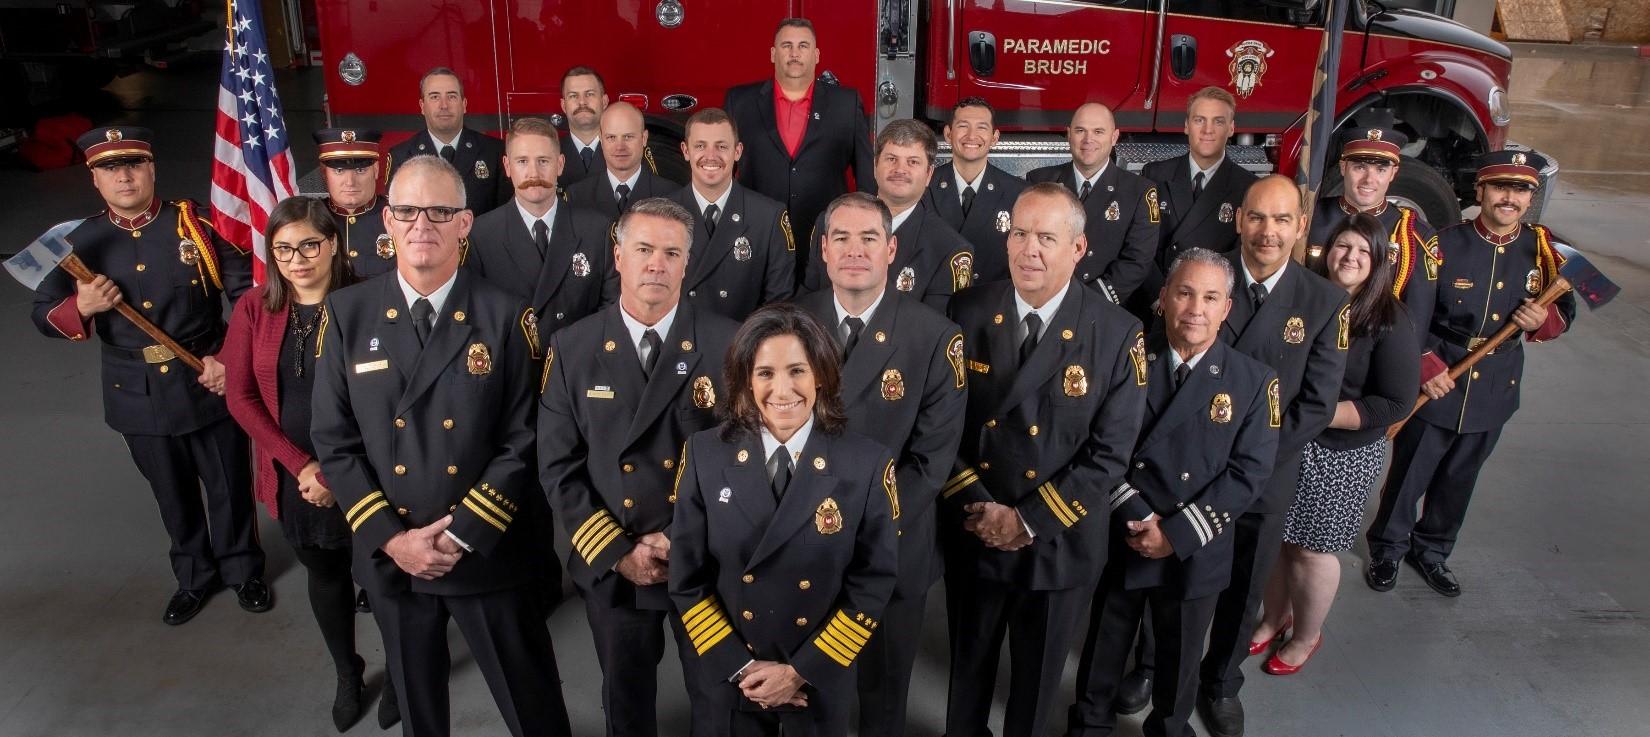 NAUMD Names Yocha Dehe Fire Department Best Dressed